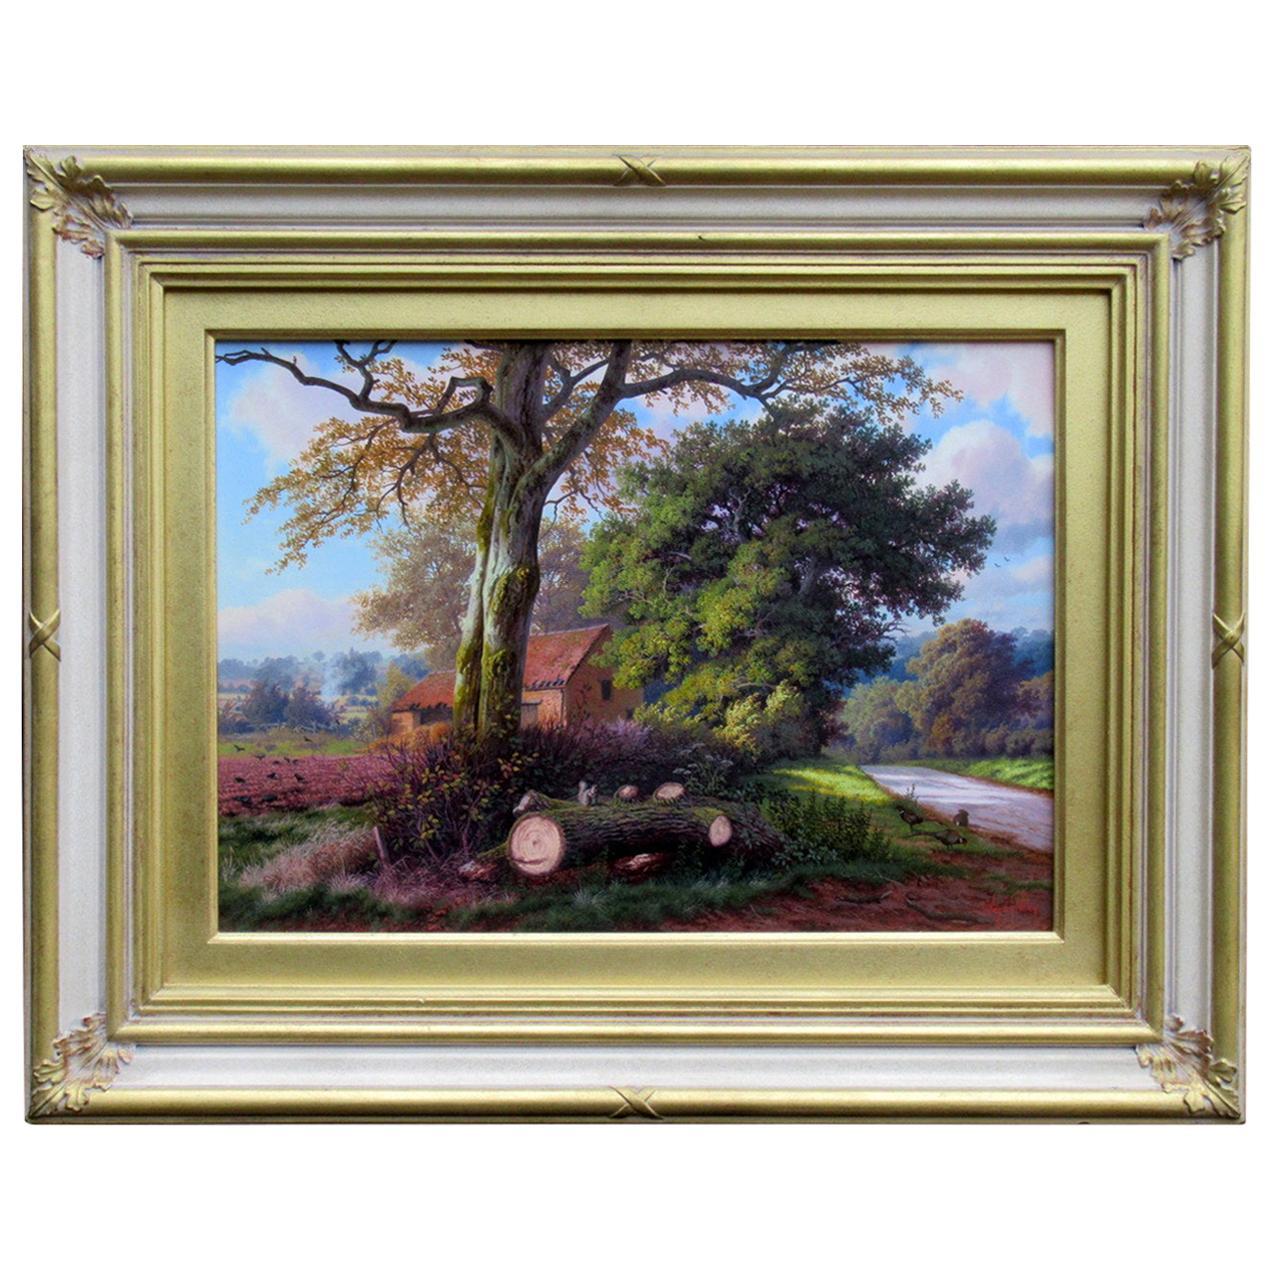 Daniel Van der Putten Oil Painting English Rural Landscape Scene Farmhouse Trees